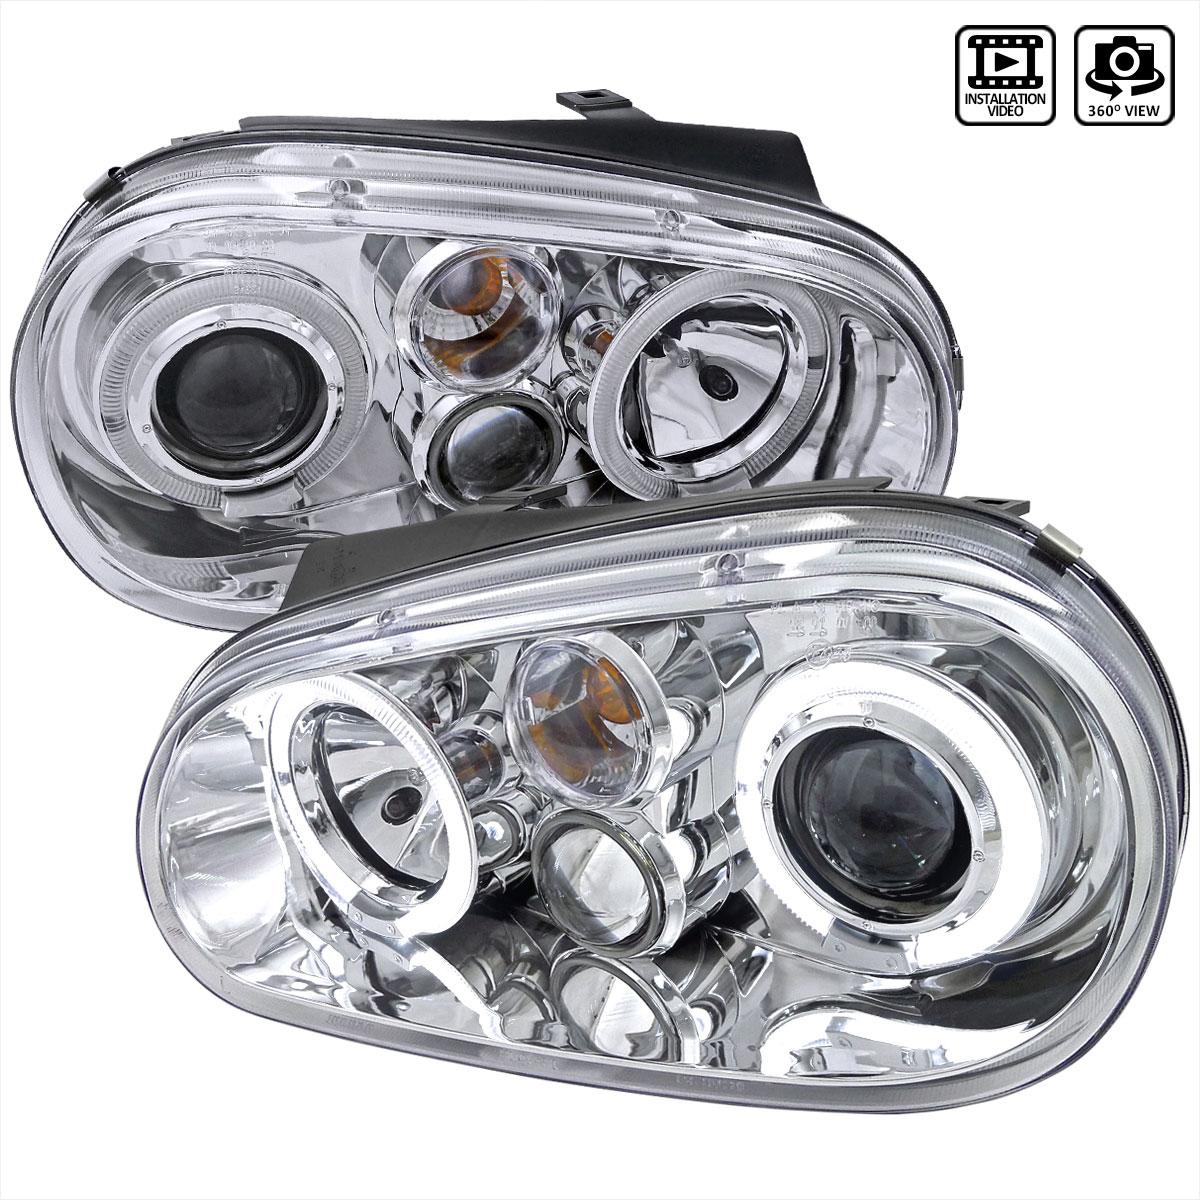 Spec-D Tuning LHP-GLF99-TM - Spec-D 99-03 Vw Golf Projector Headlights Chrome